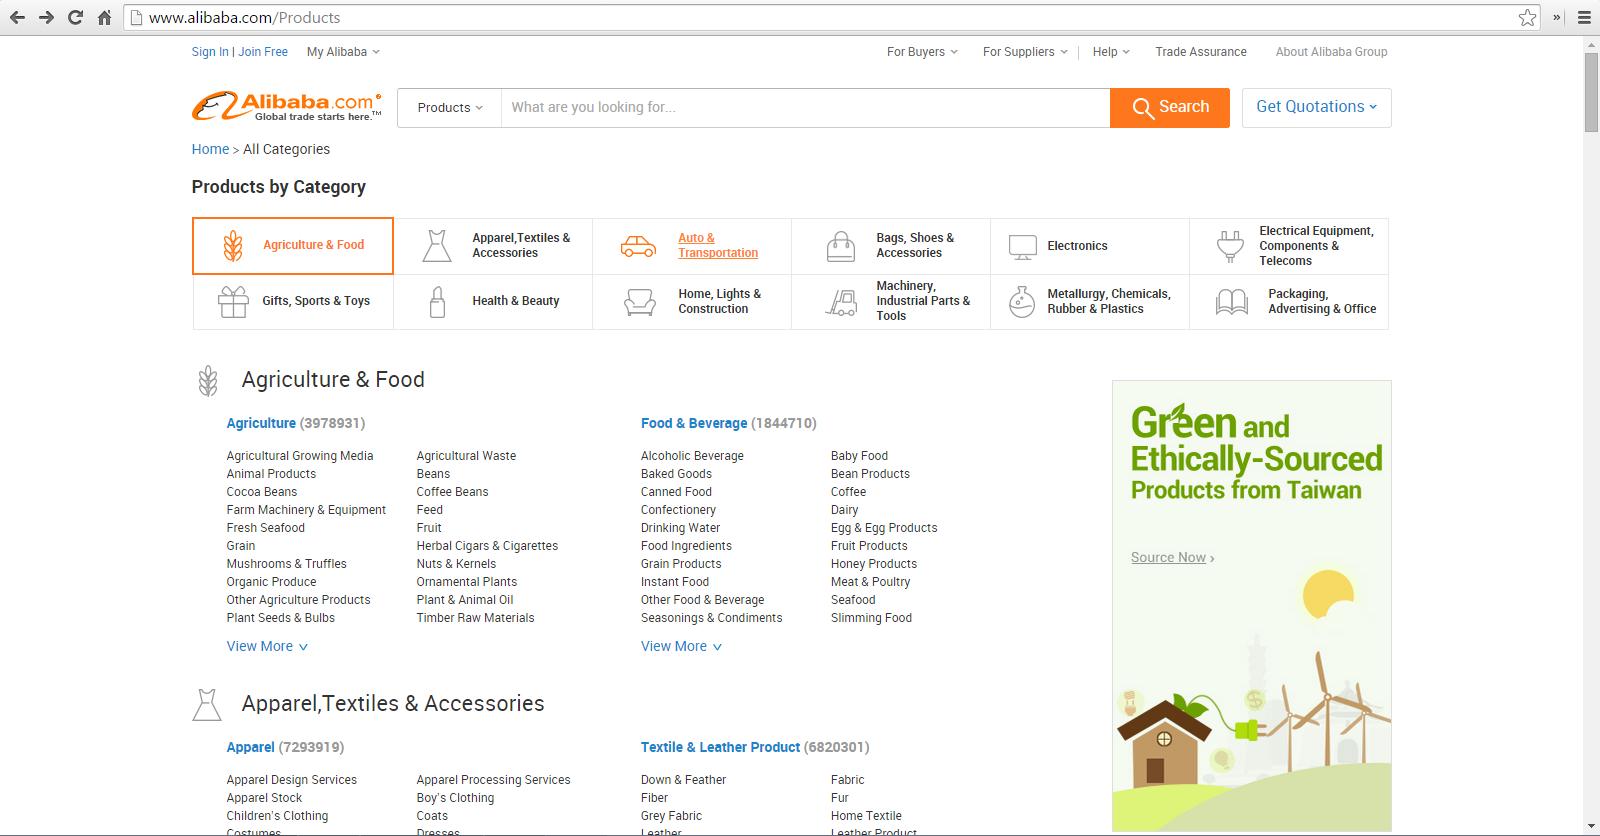 Wholesaler Market - Alibaba.com